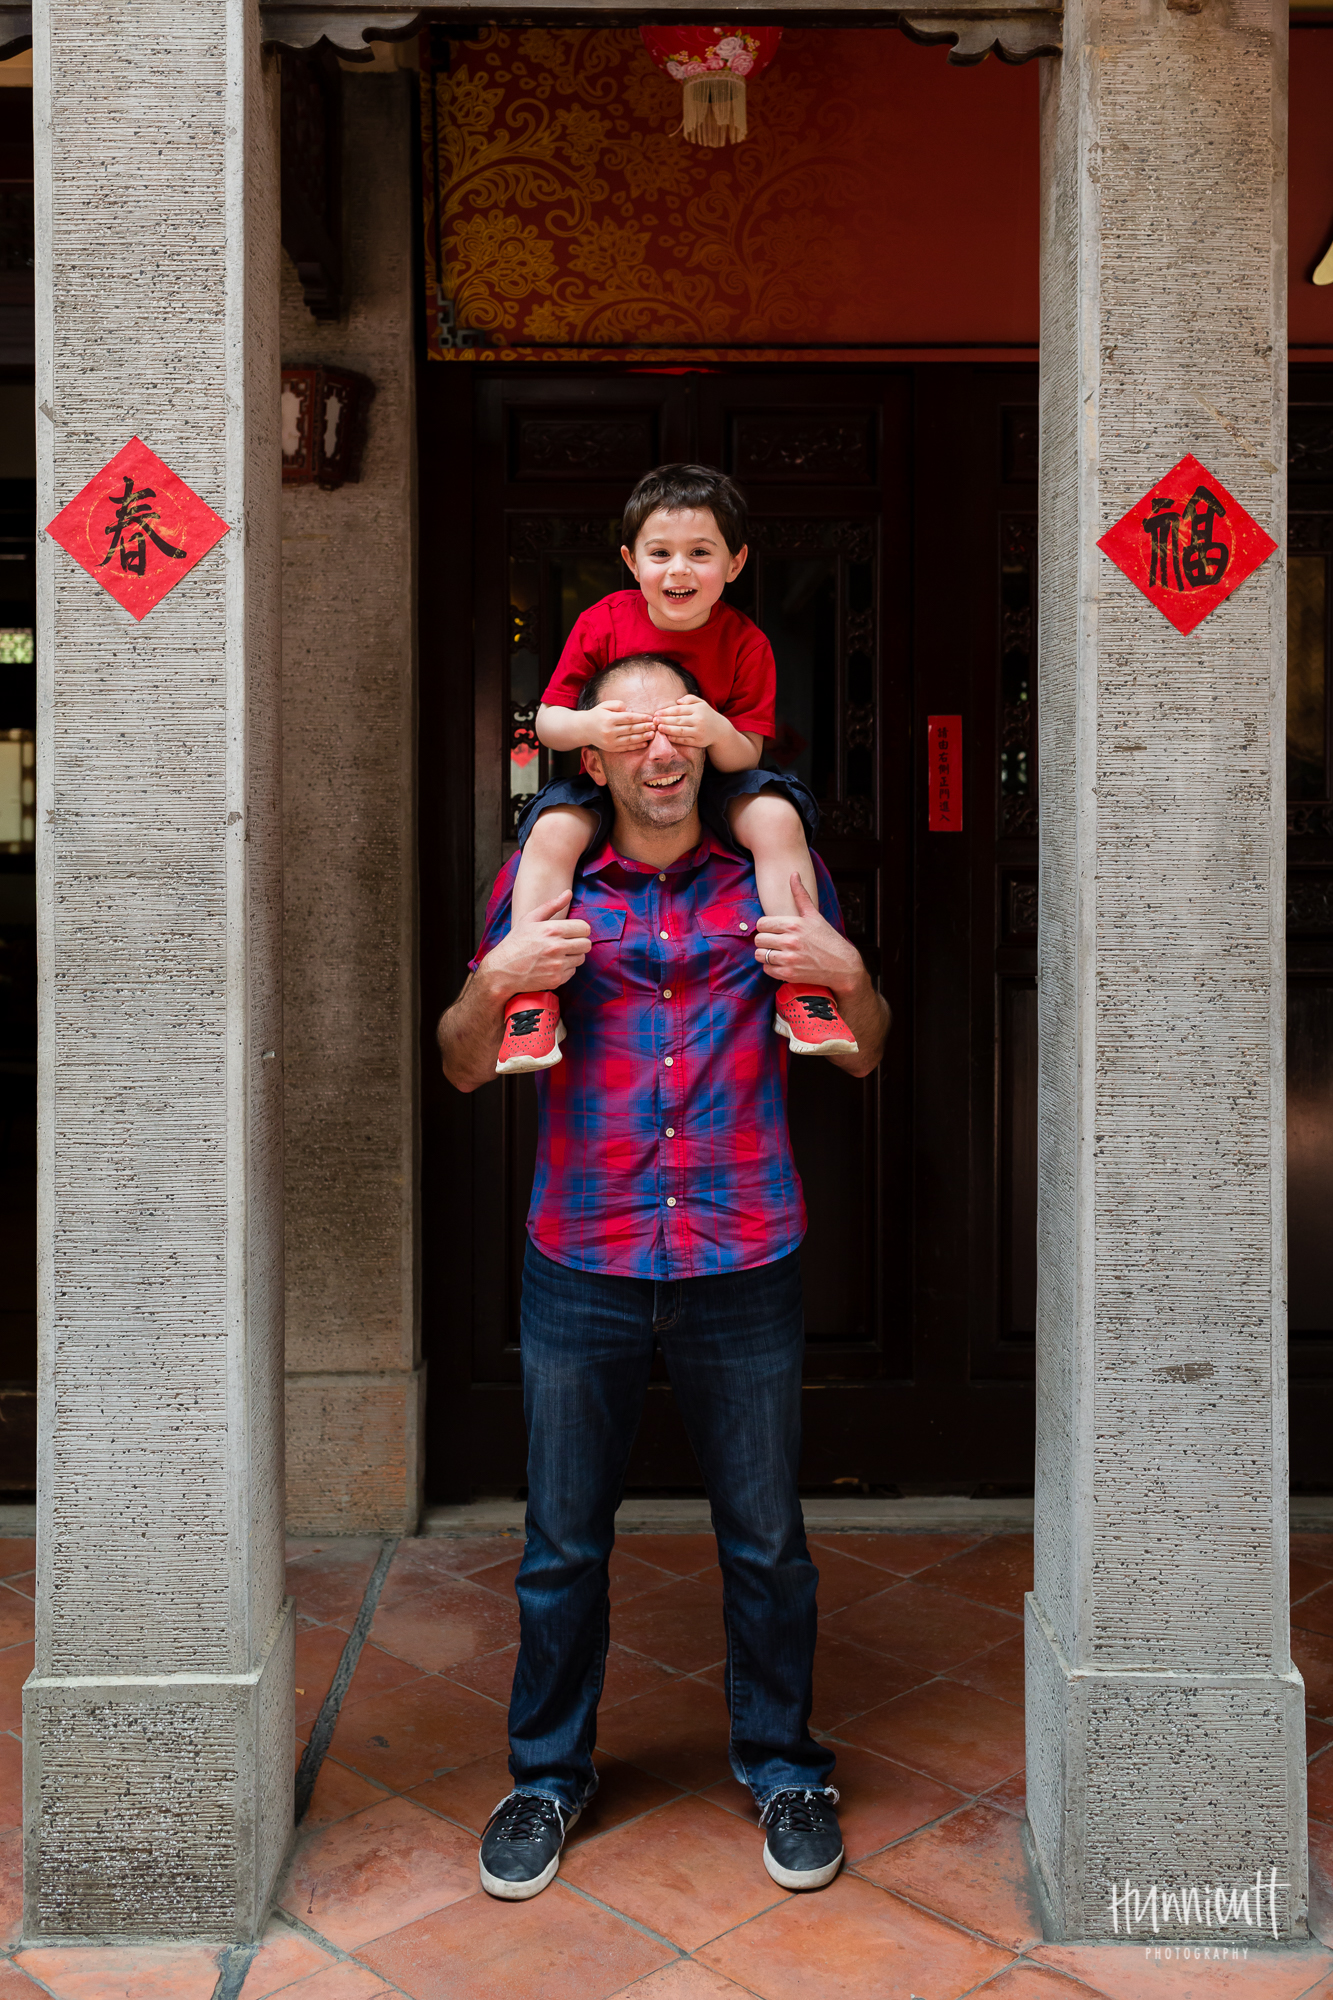 Family-Outdoor-Lifestyle-Modern-Urban-Travel-Culture-HunnicuttPhotography-RebeccaHunnicuttFarren-Taichung-Taiwan-8